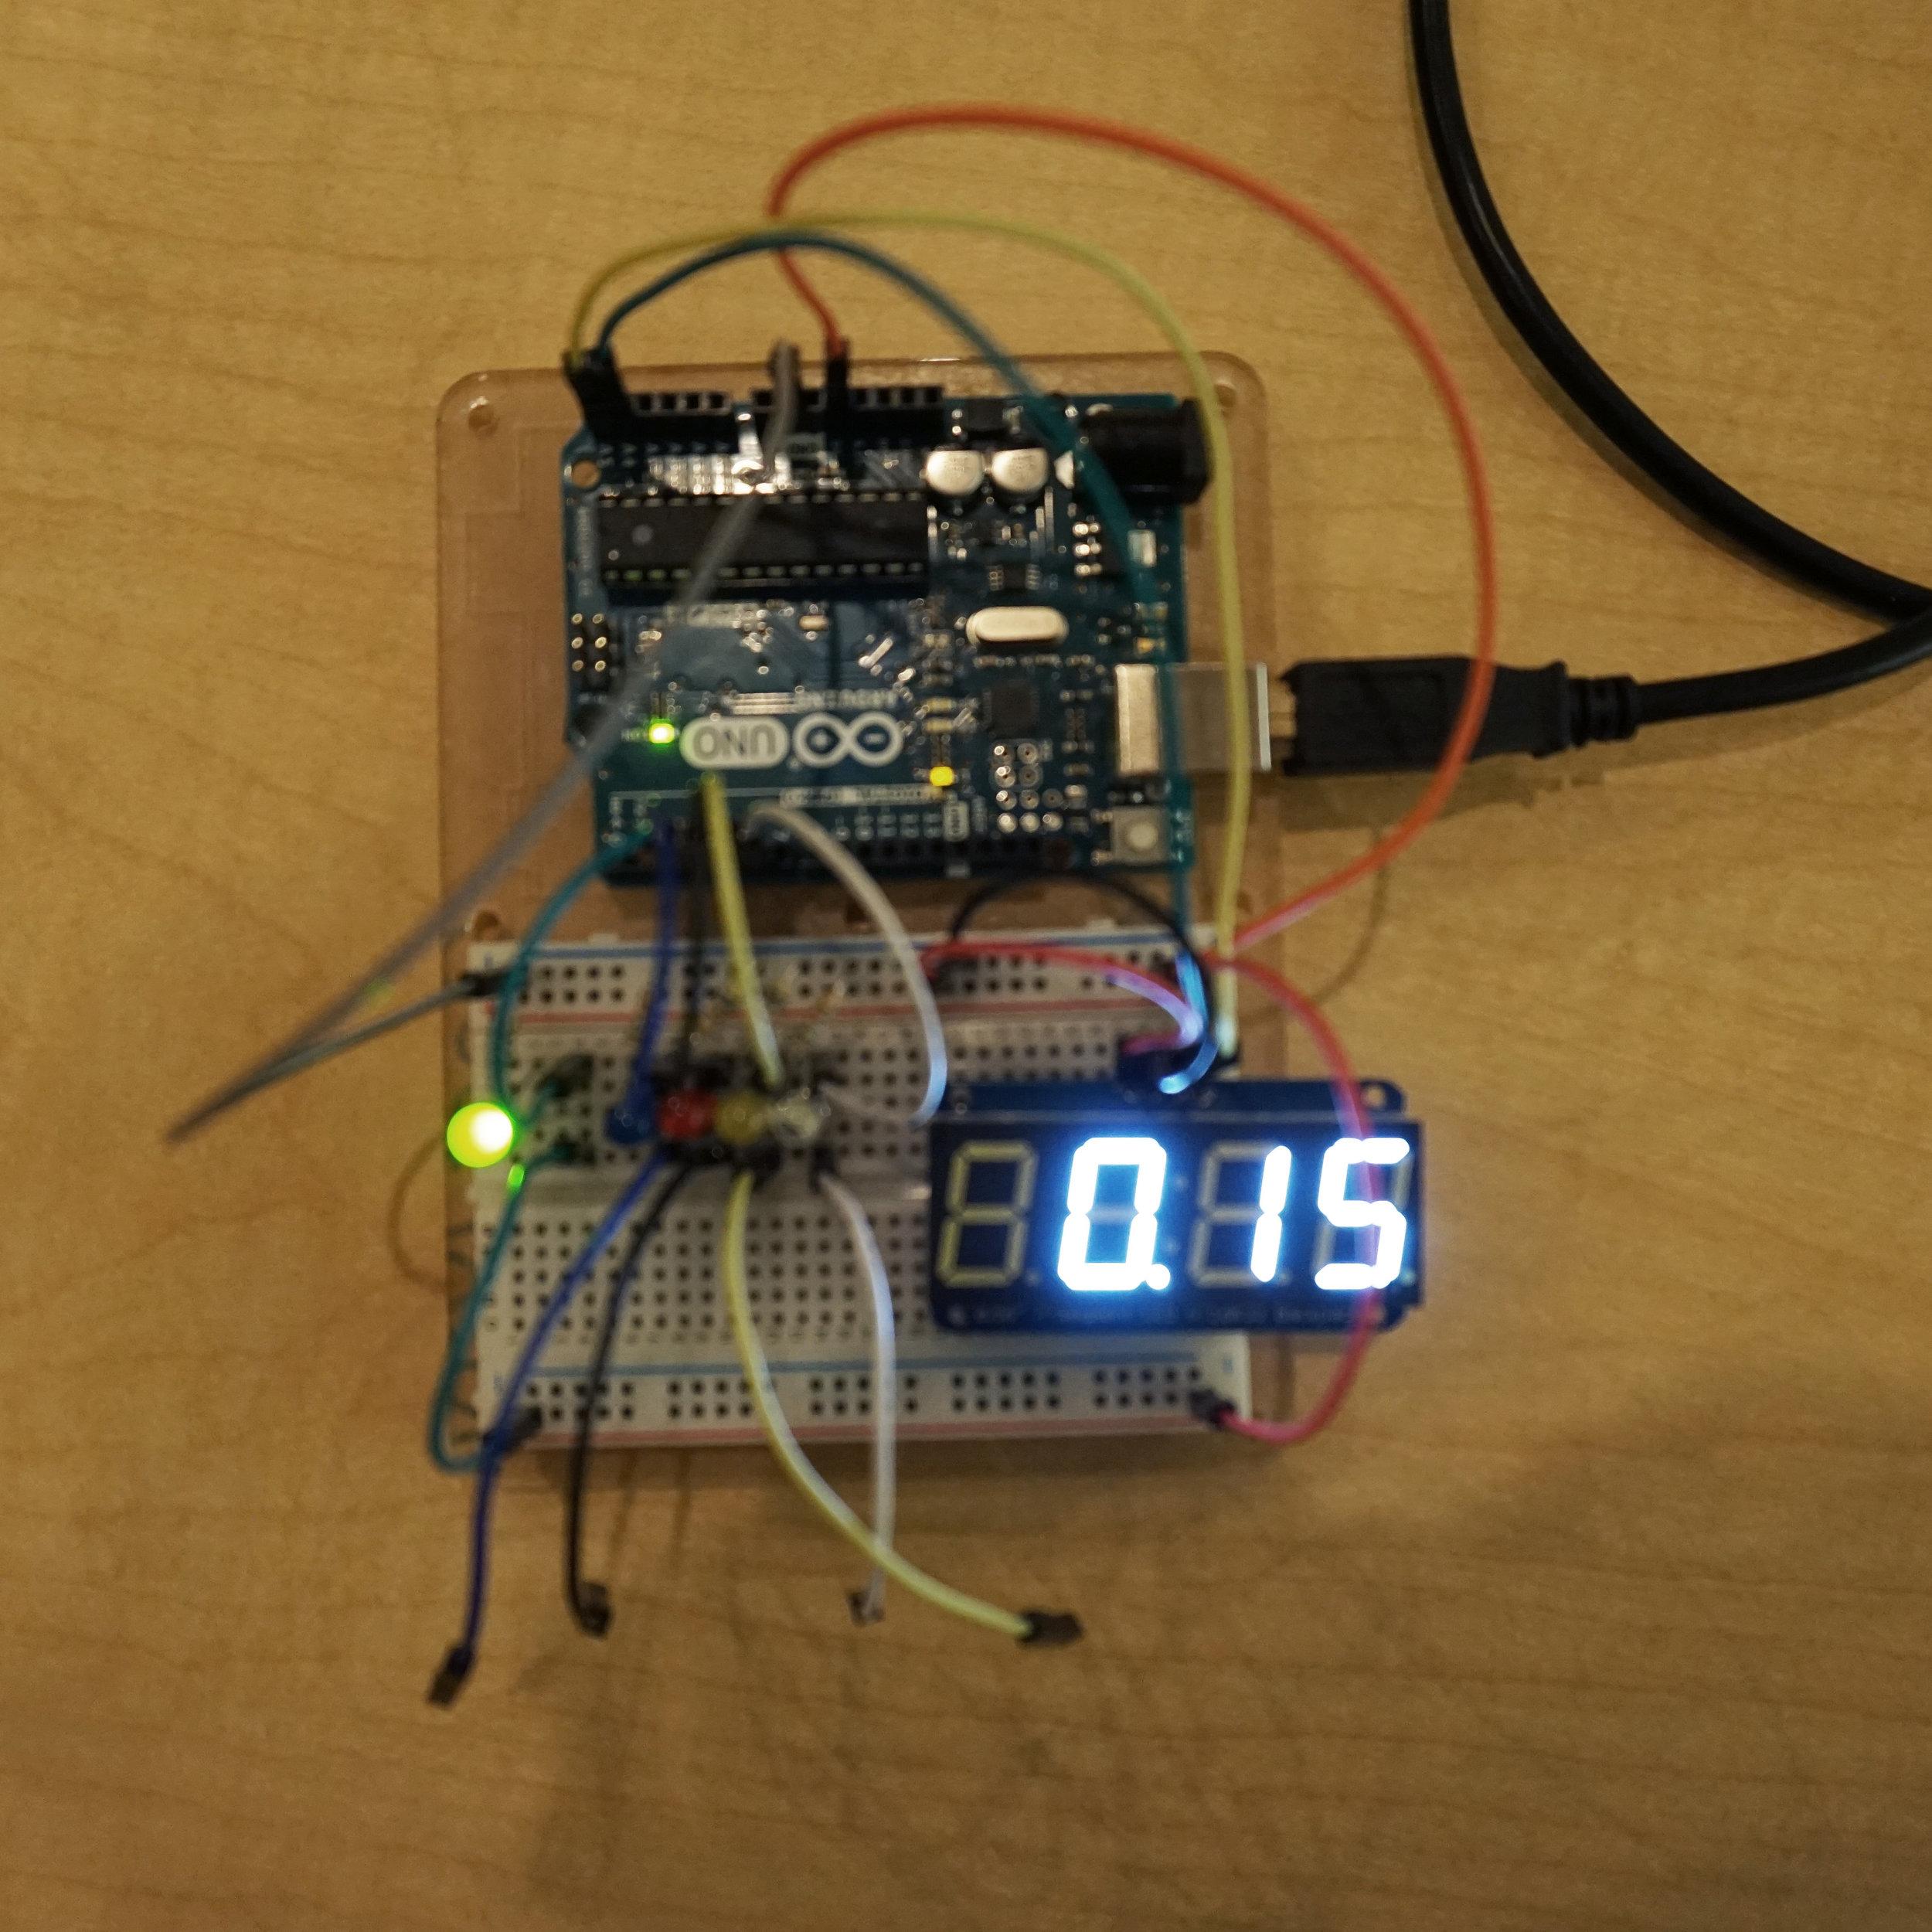 Testing the digital display.